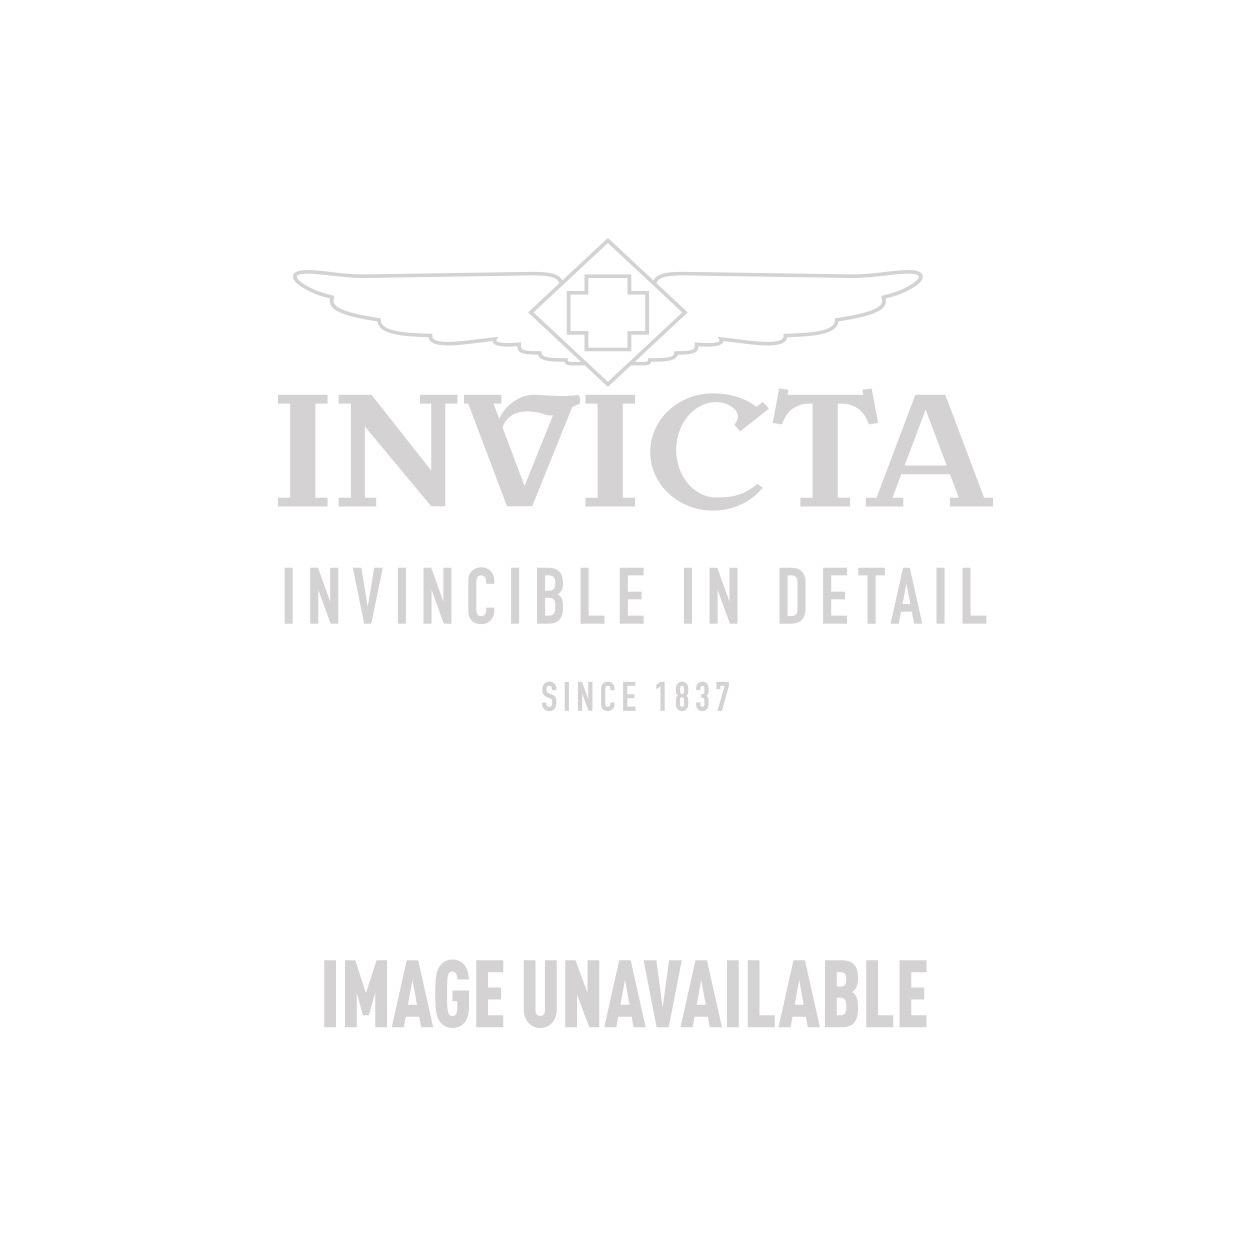 Invicta Subaqua  Quartz Watch - Stainless Steel case with Black tone Polyurethane band - Model 6576